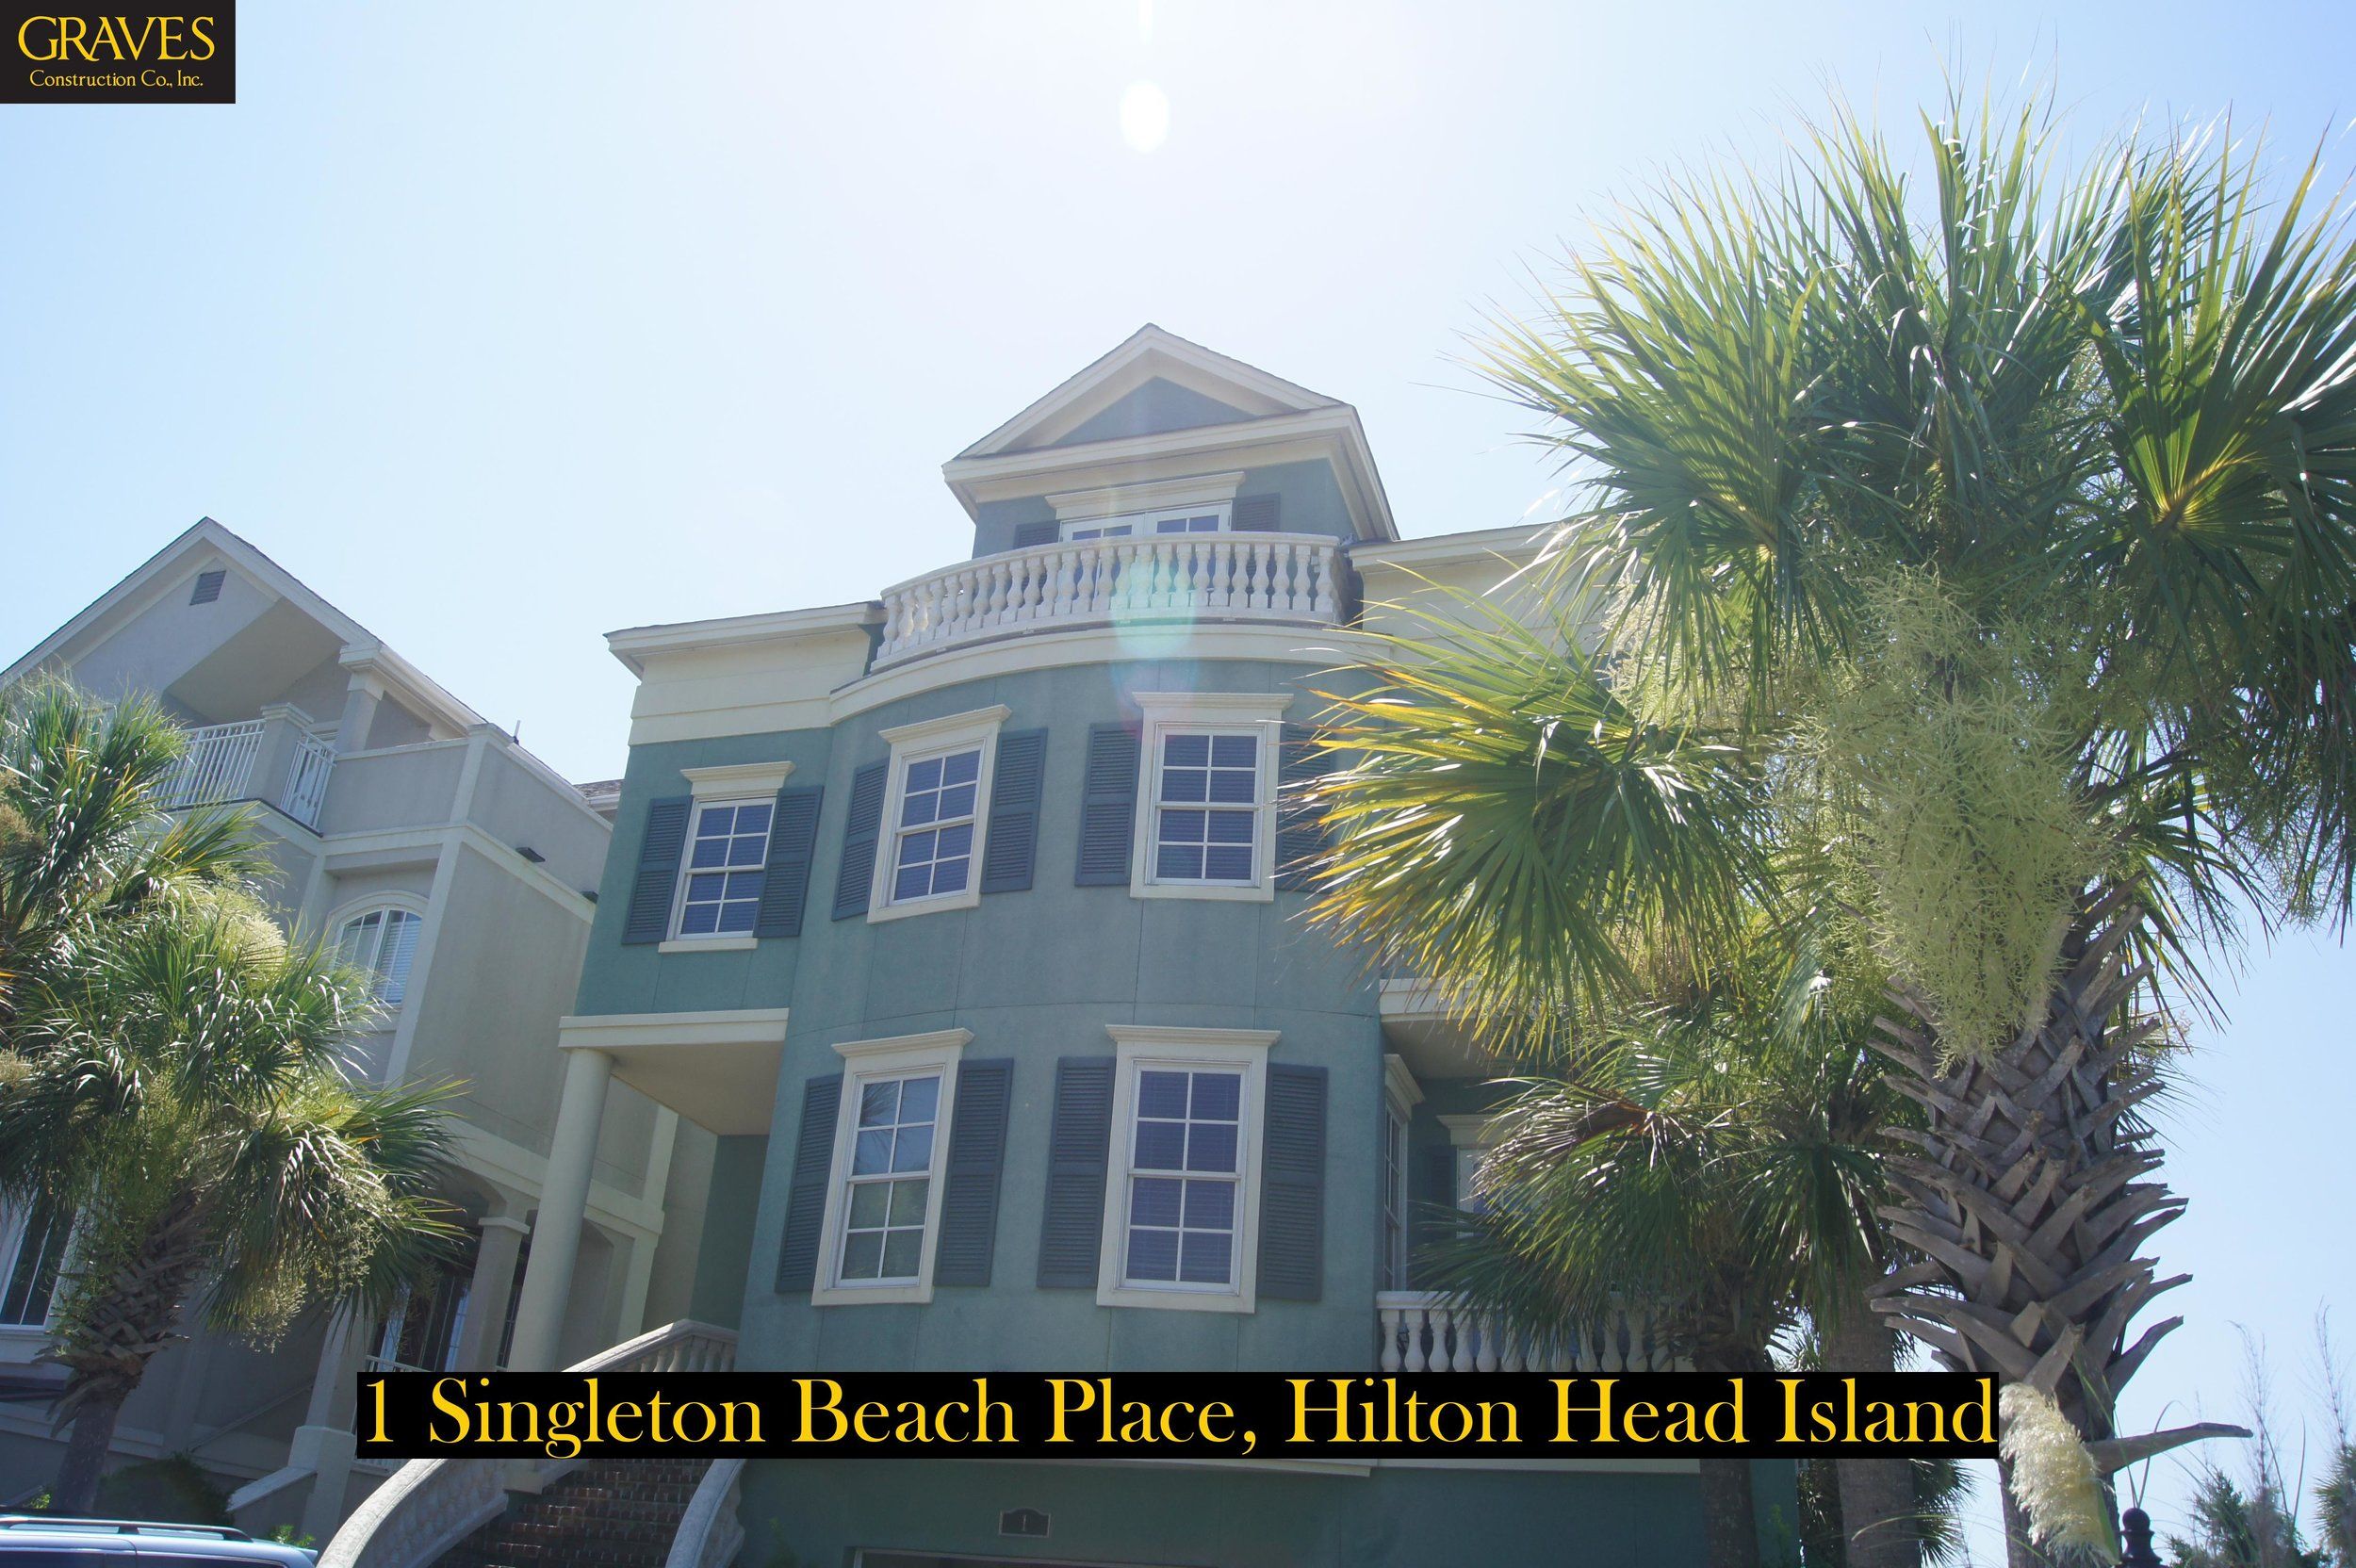 1 Singleton Beach Pl - 5